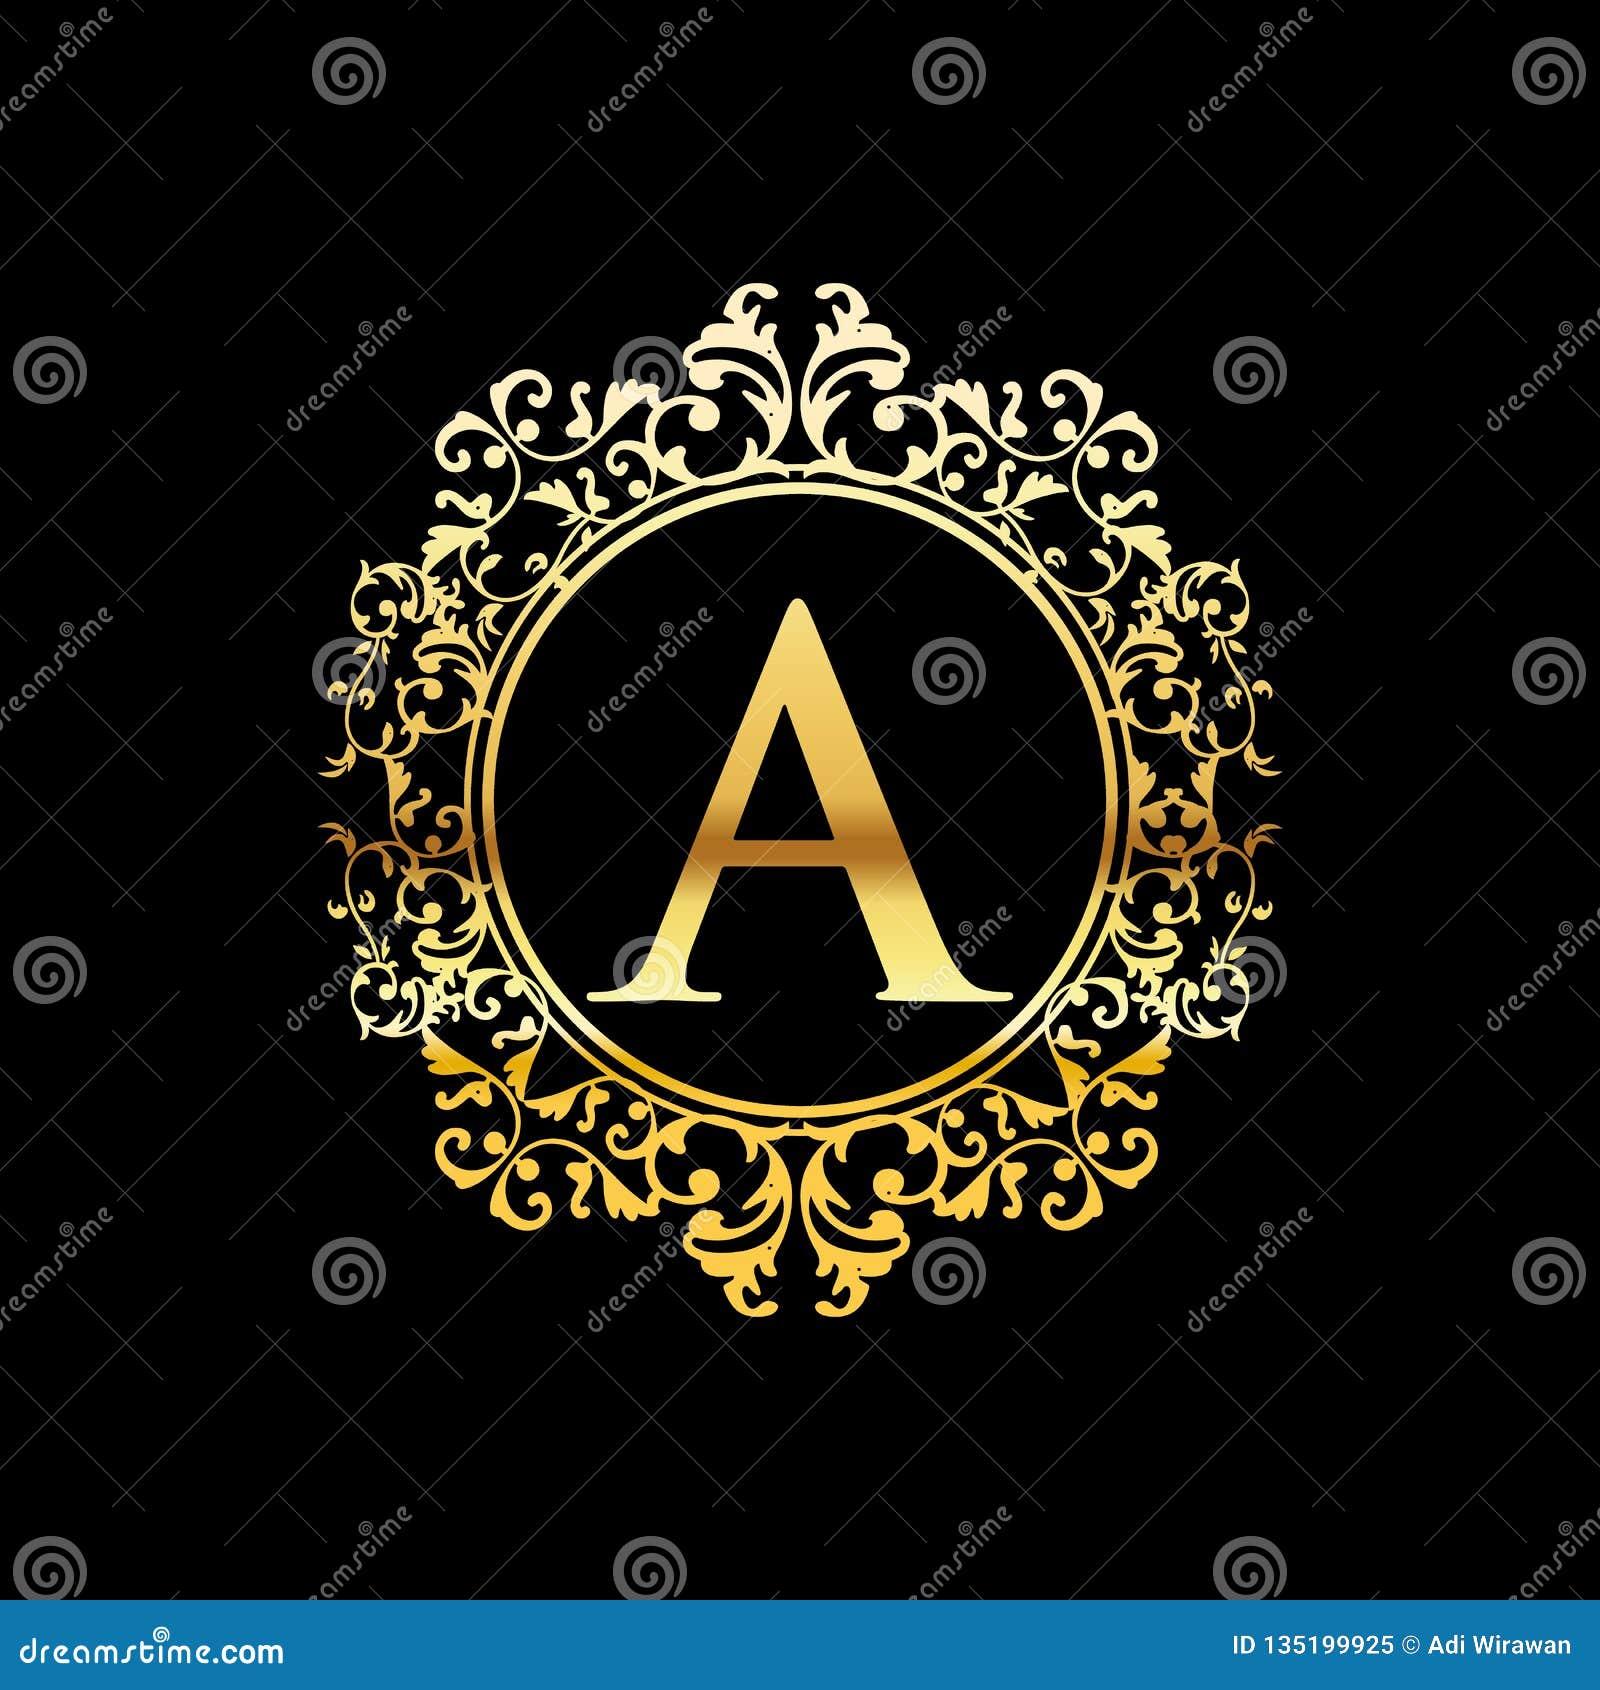 Illustration Of Gold Luxury Logo Design Stock Vector Illustration Of Arabic Decoration 135199925